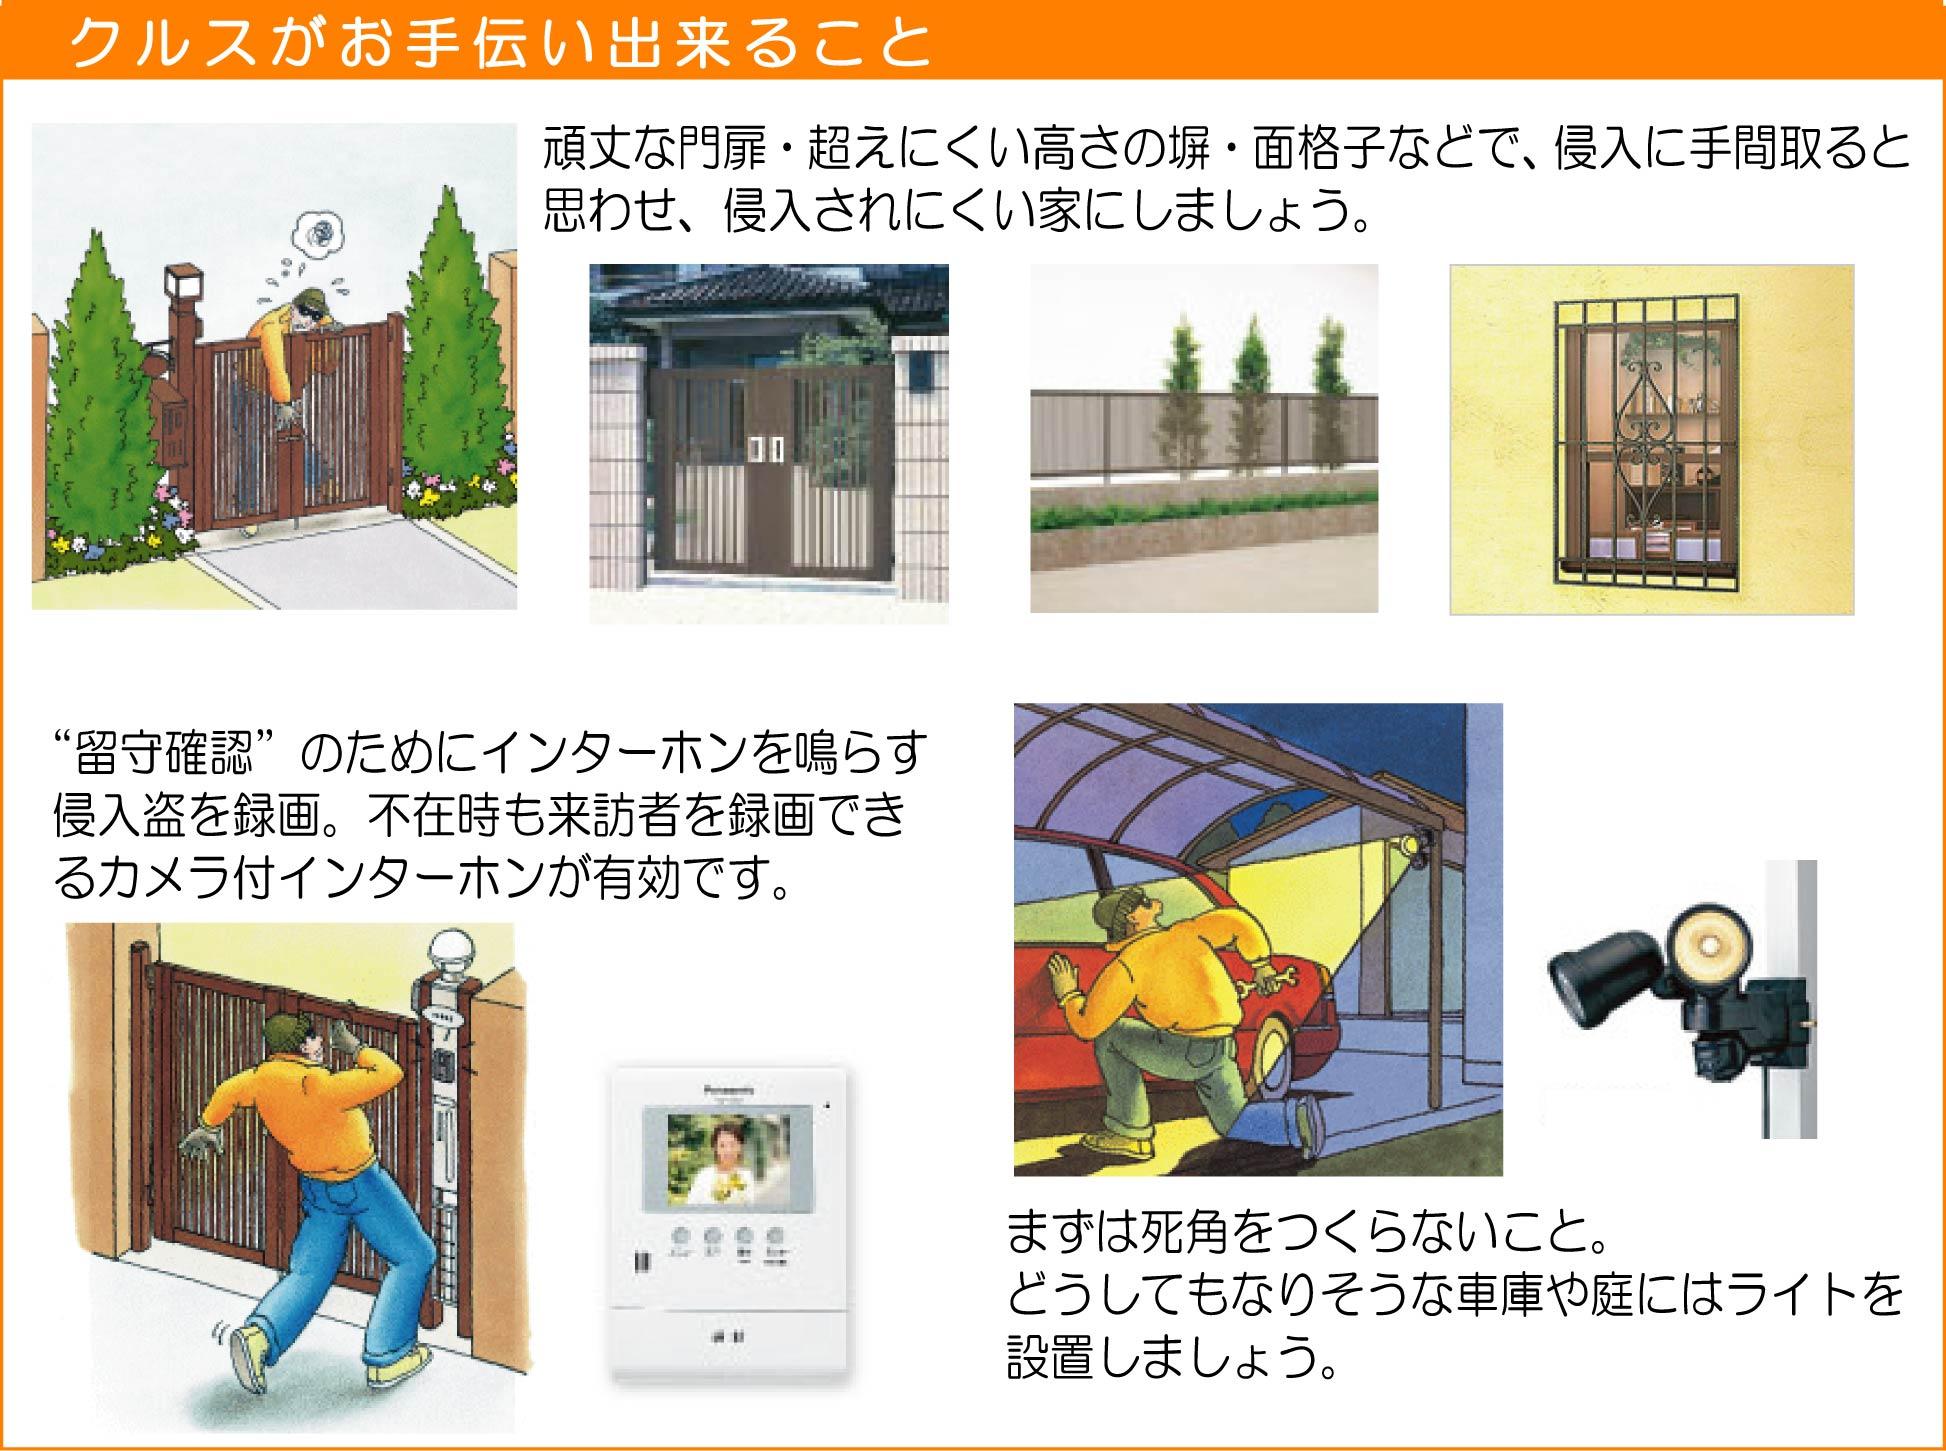 KuraSi-natu-sin72-14.jpg